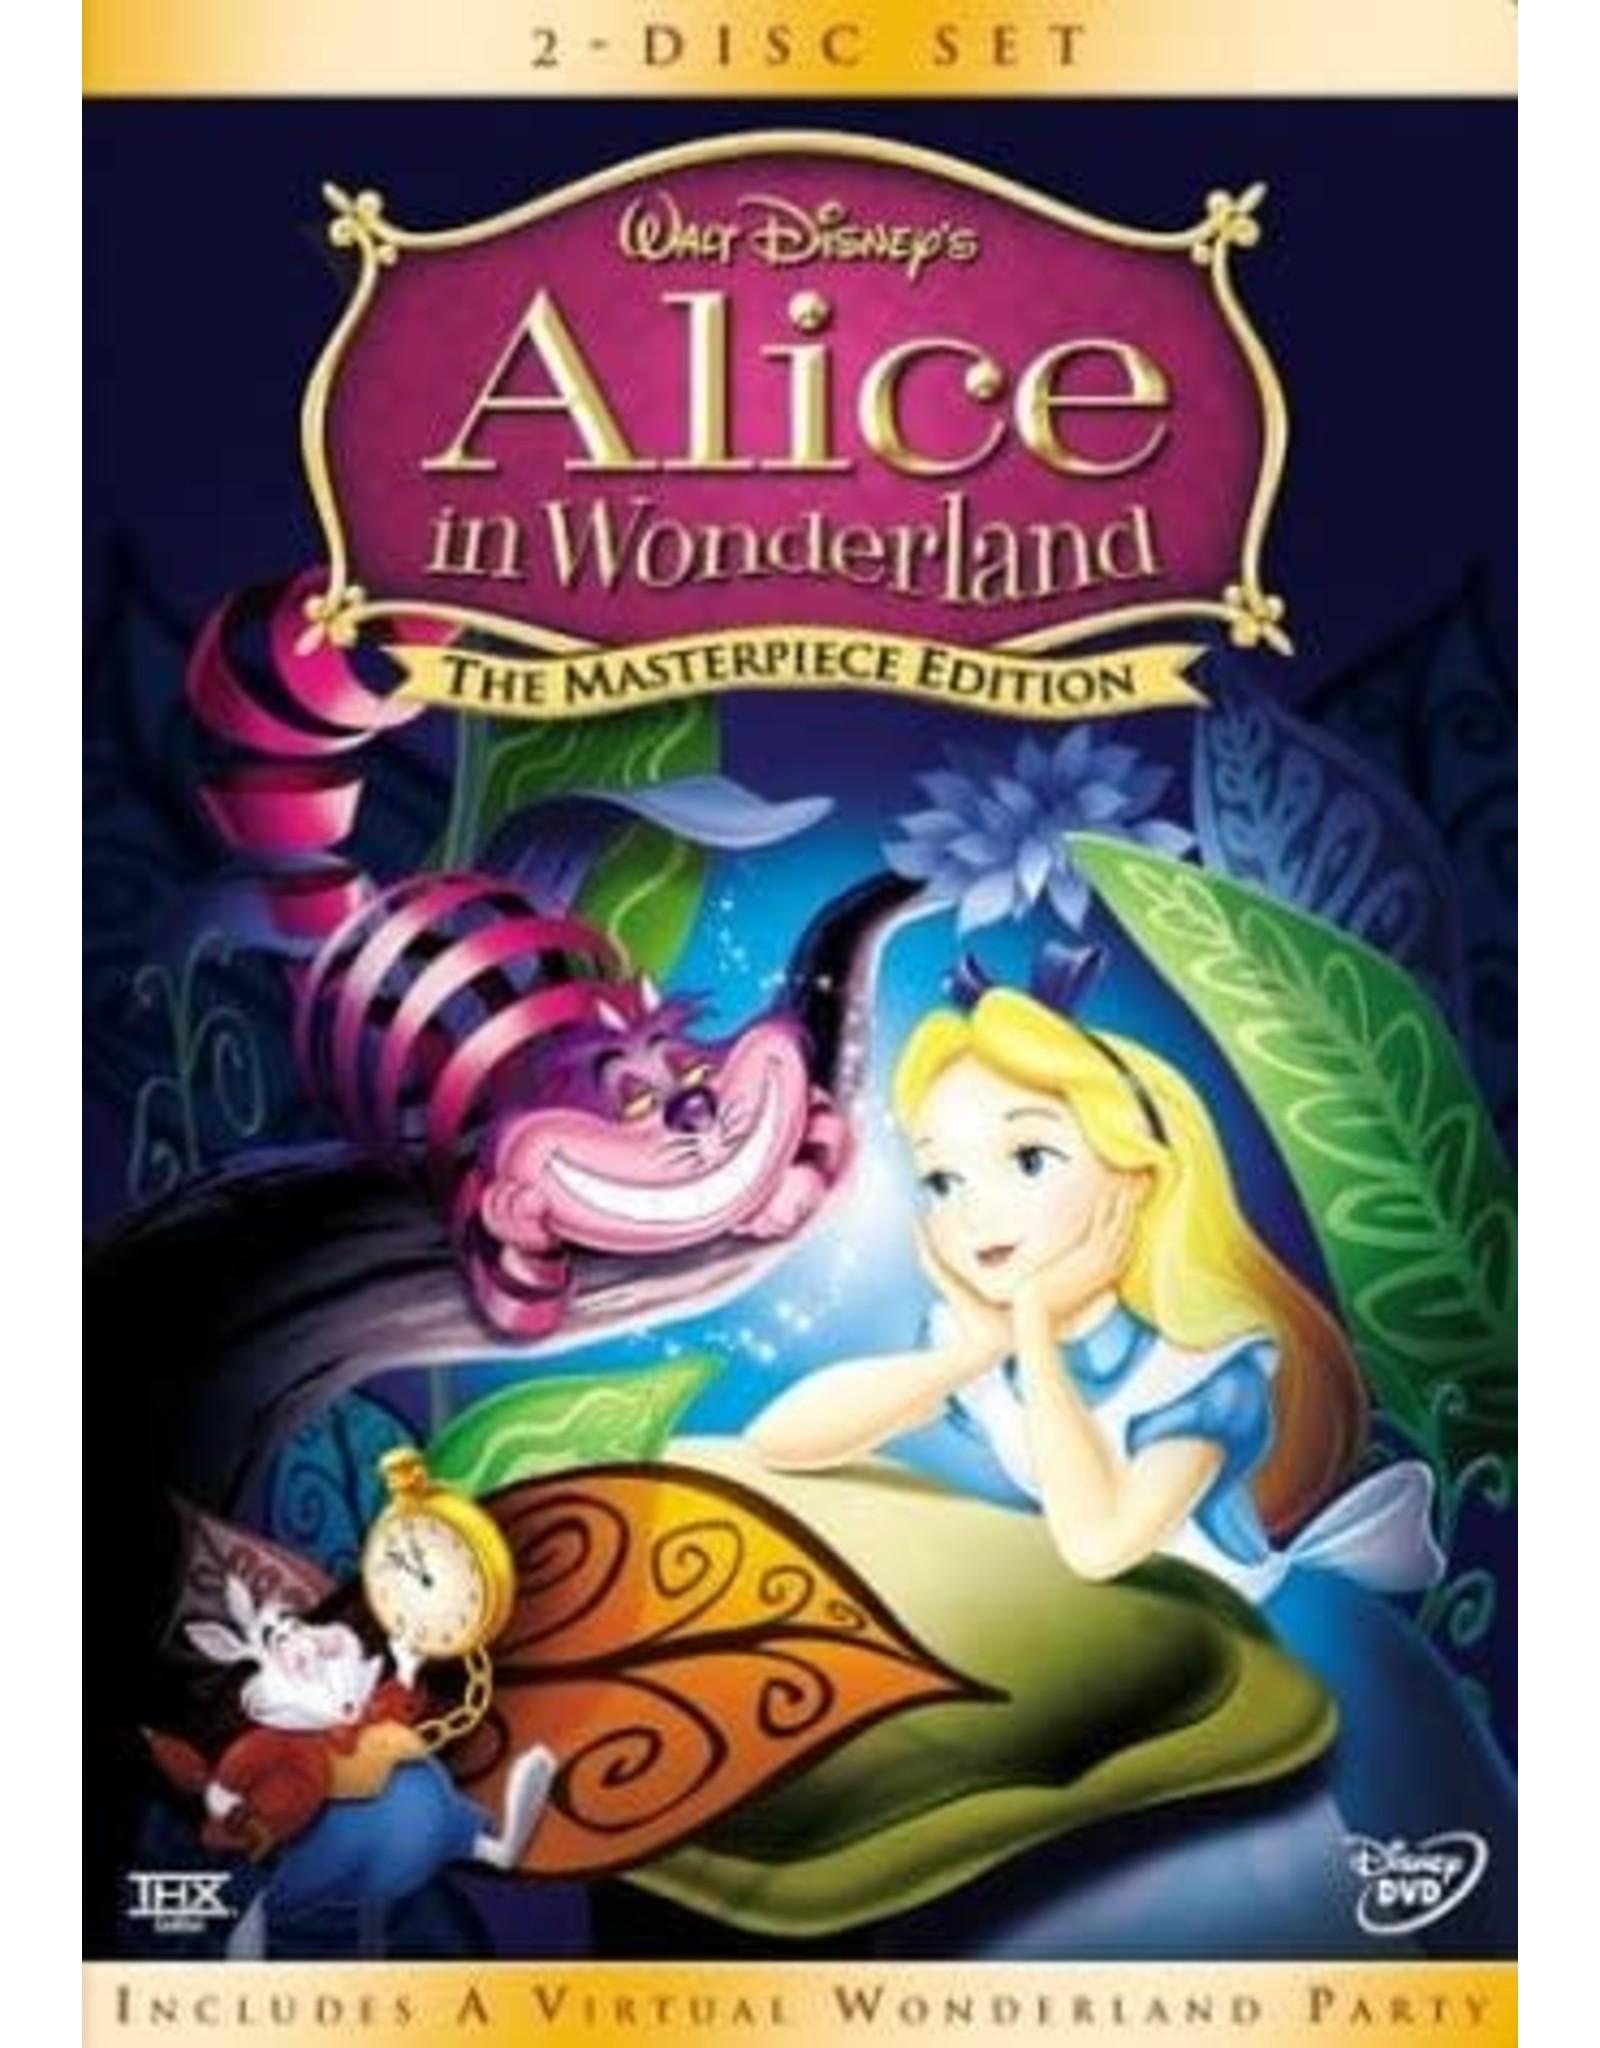 Disney Alice in Wonderland - The Masterpiece Edition